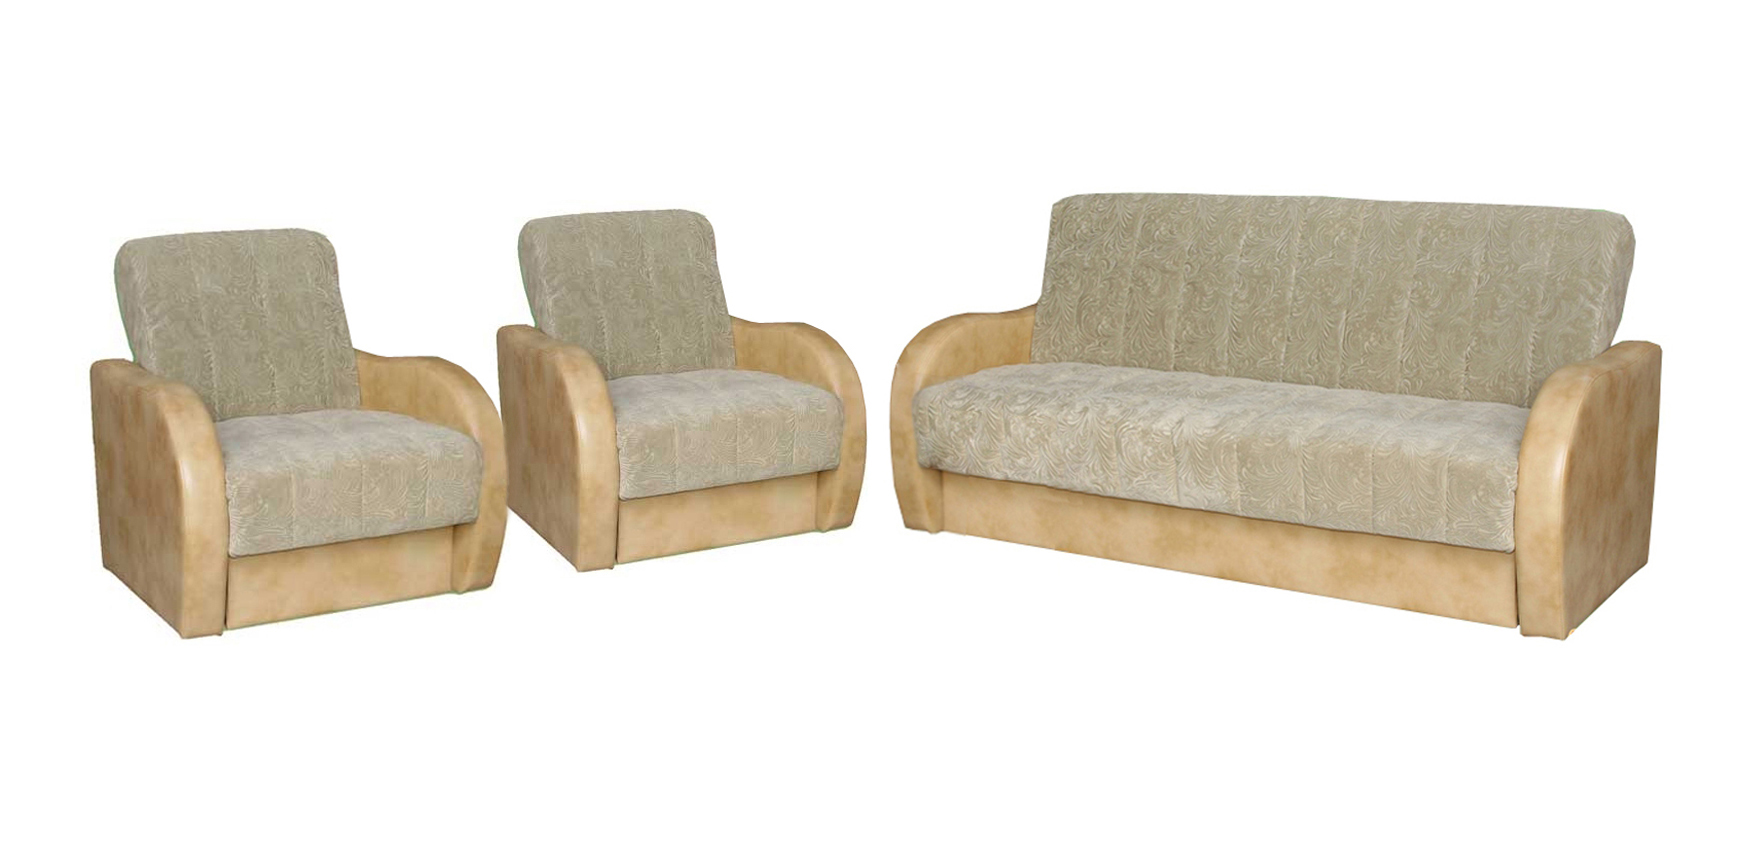 Комплект мягкой мебели Прима-Люкс 3+1+1